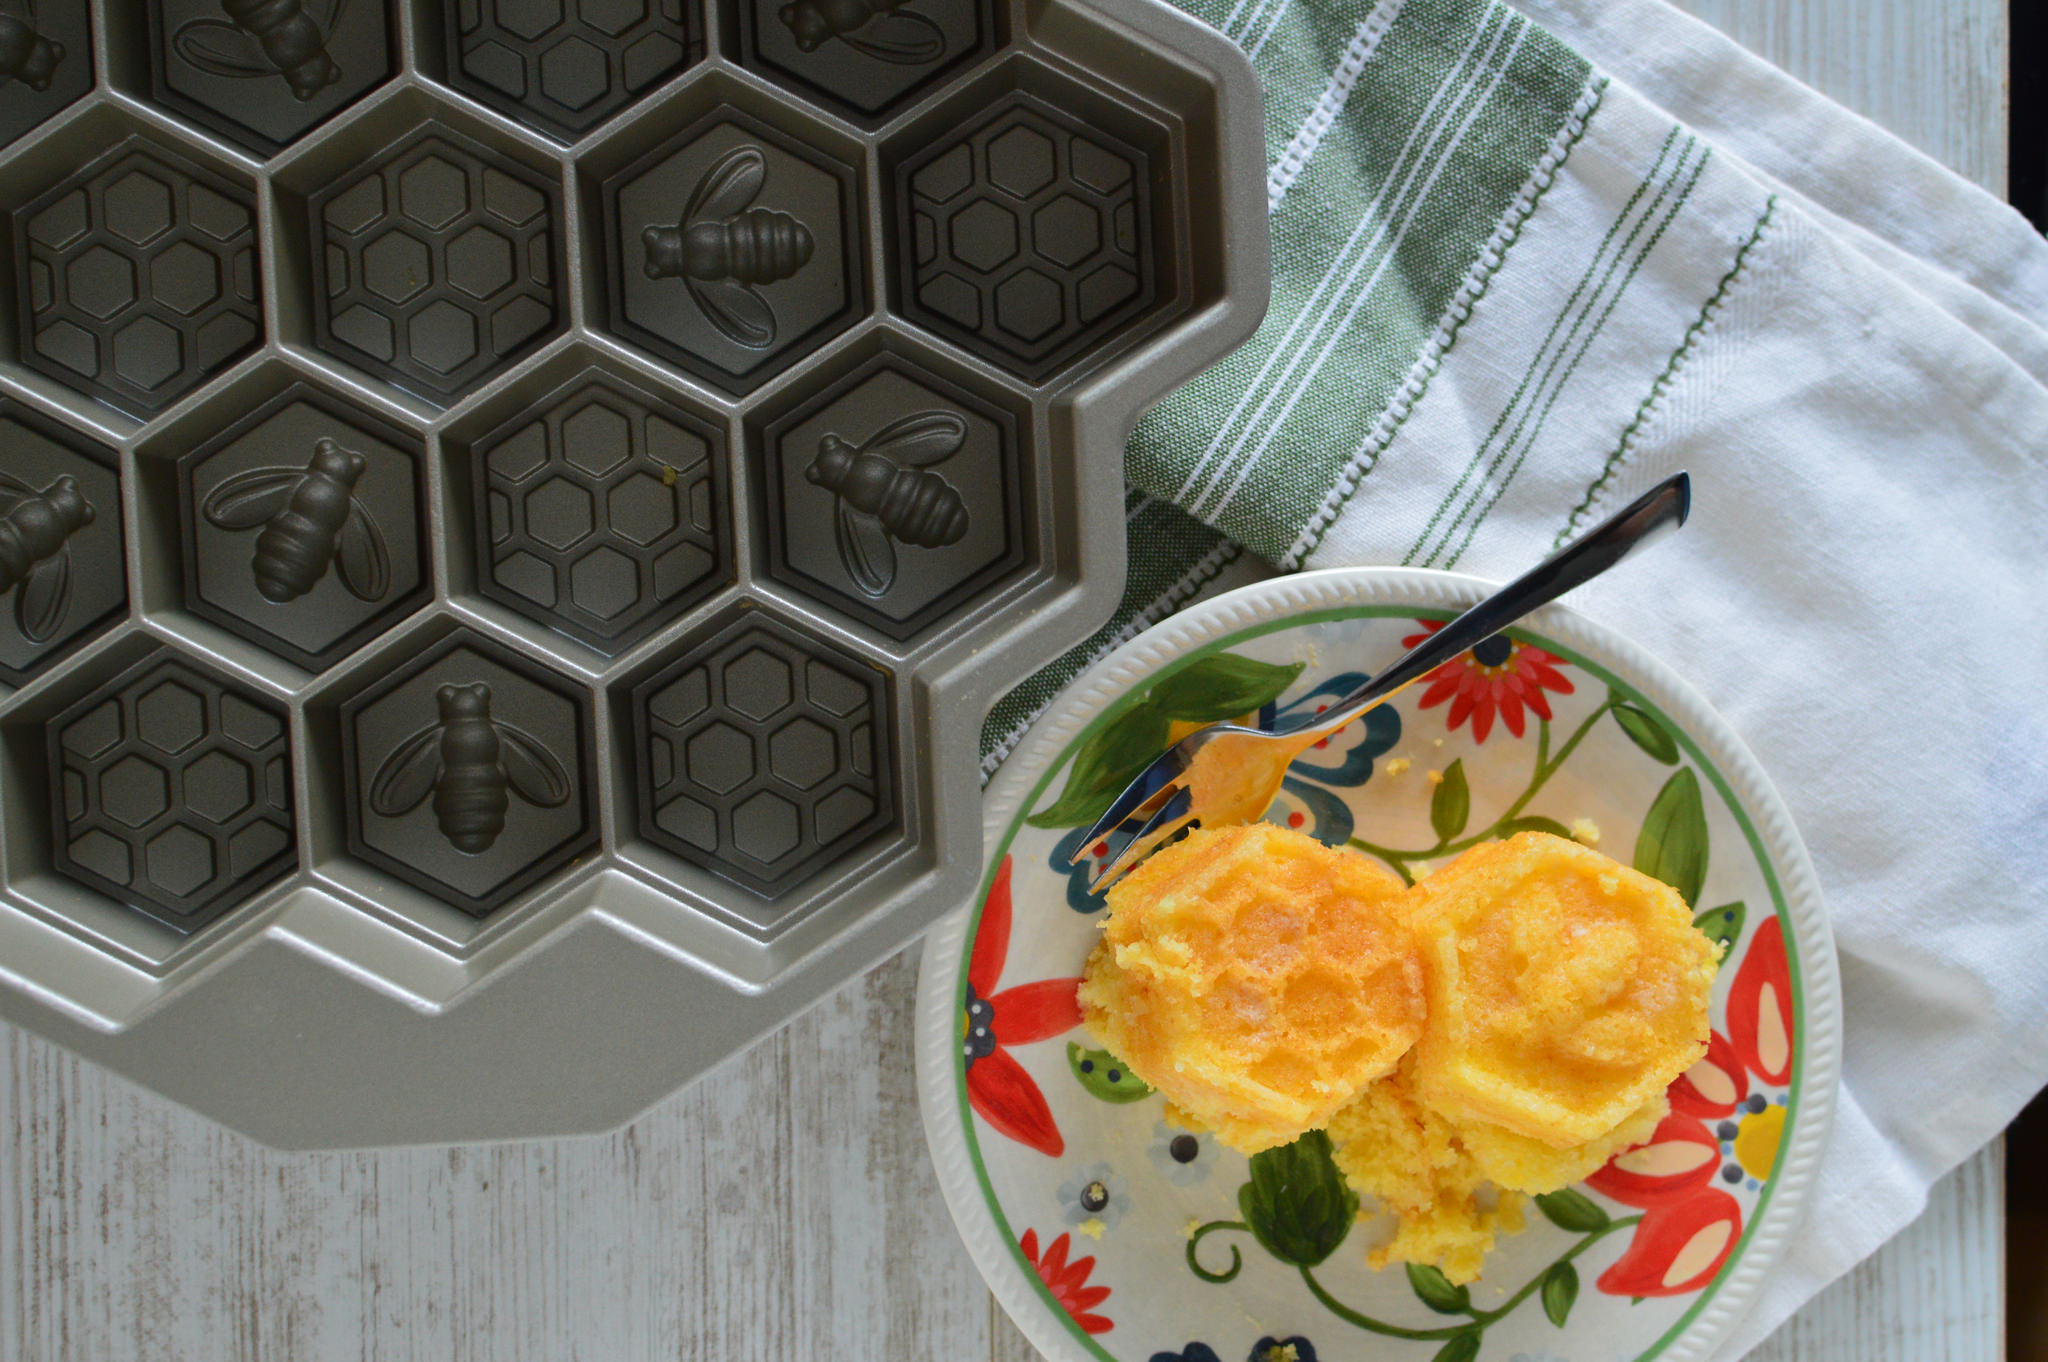 Jamie Oliver Nan S Lemon Drizzle Cake Recipe: Lemon Cake In My Honeycomb Cake Pan